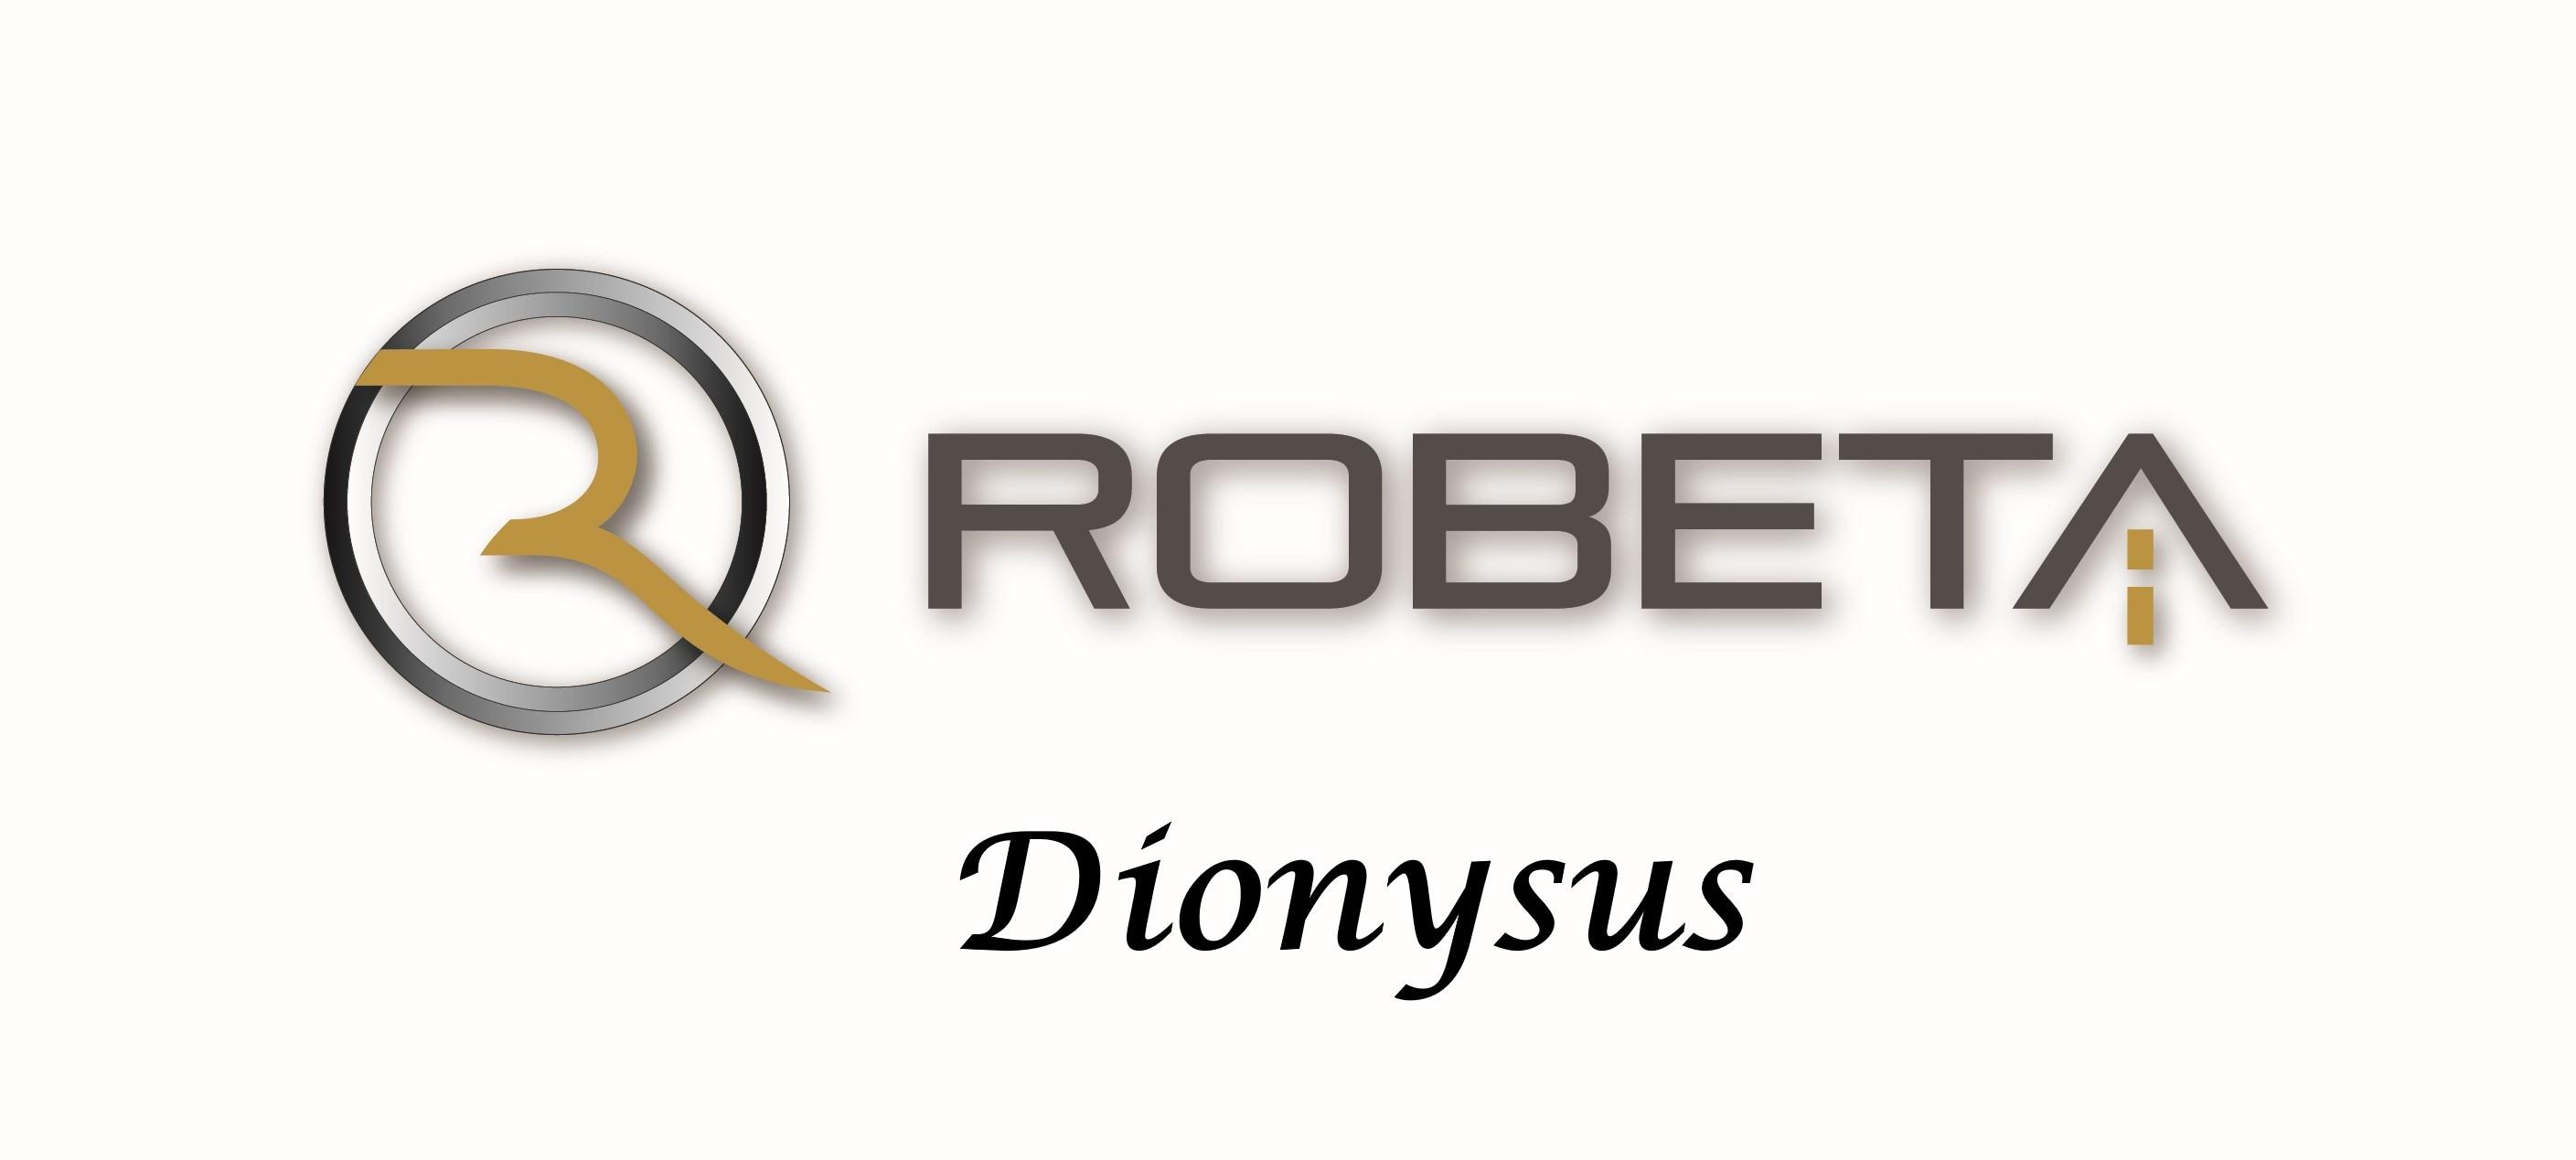 ROBETA Dionysus (2)